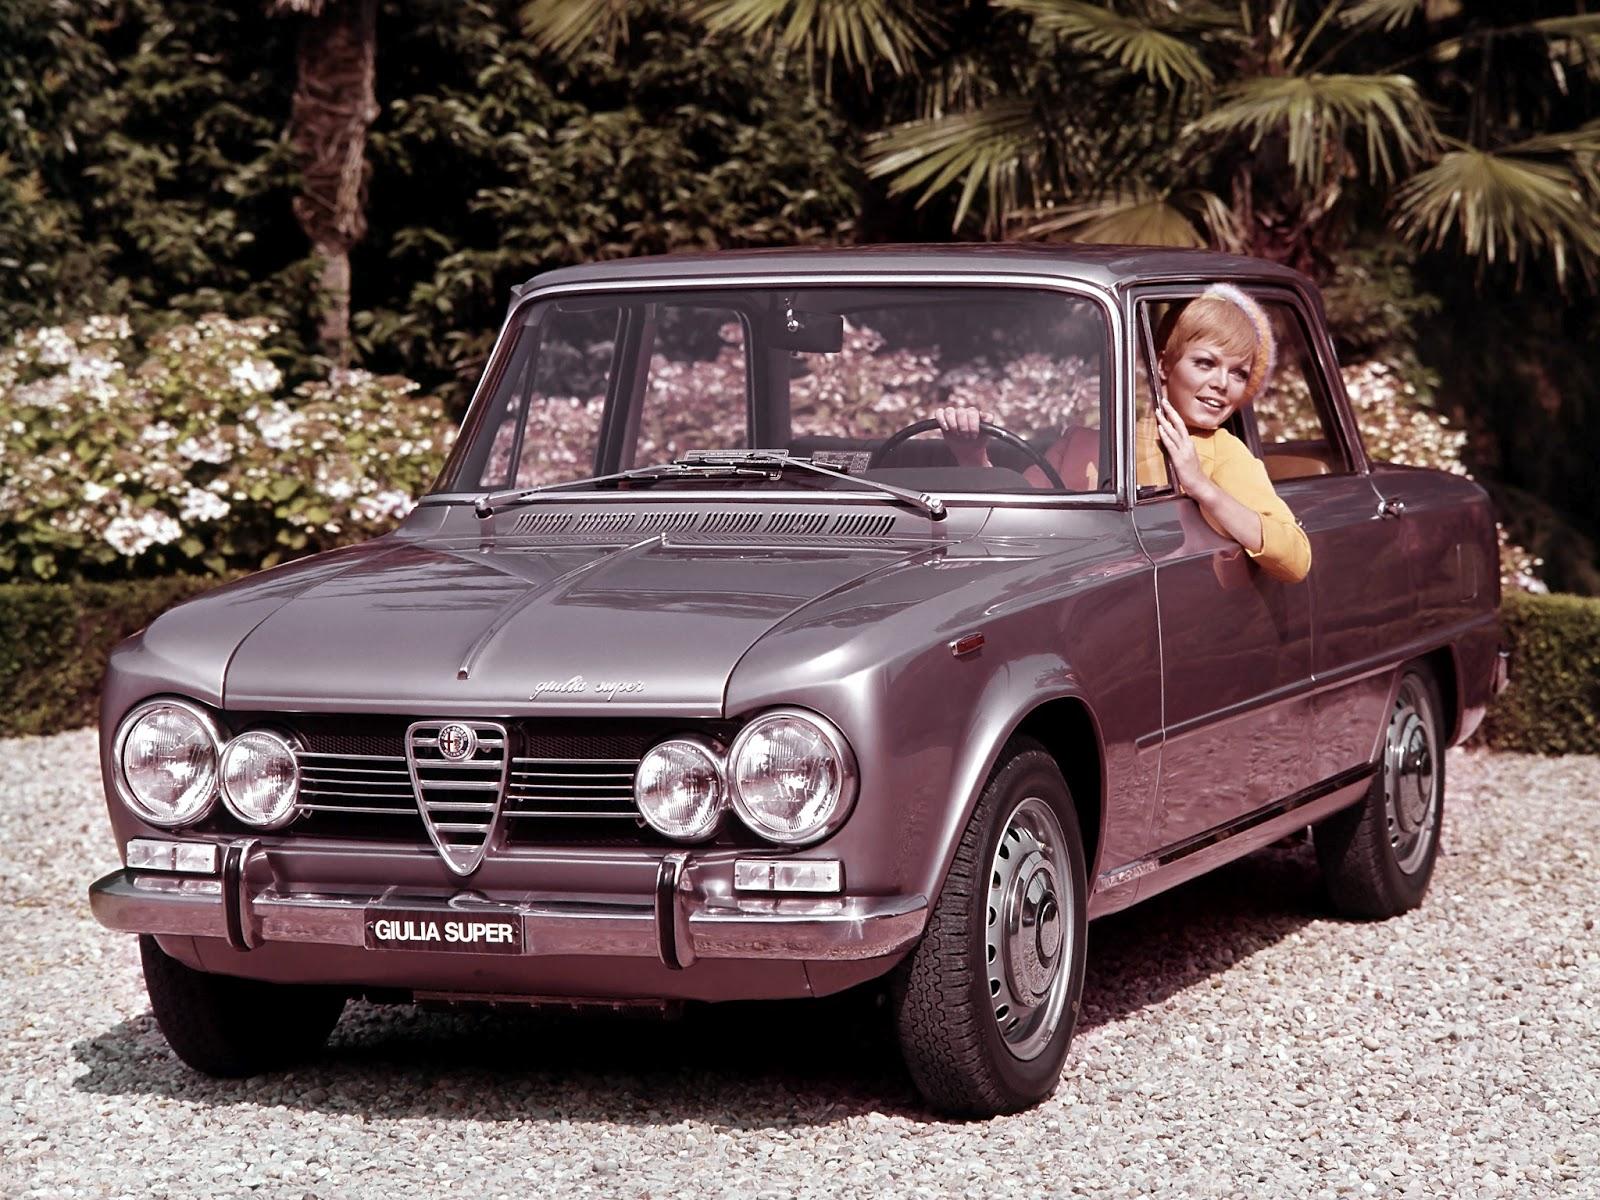 retro cars alfa romeo giulia super 105 39 1967 74. Black Bedroom Furniture Sets. Home Design Ideas